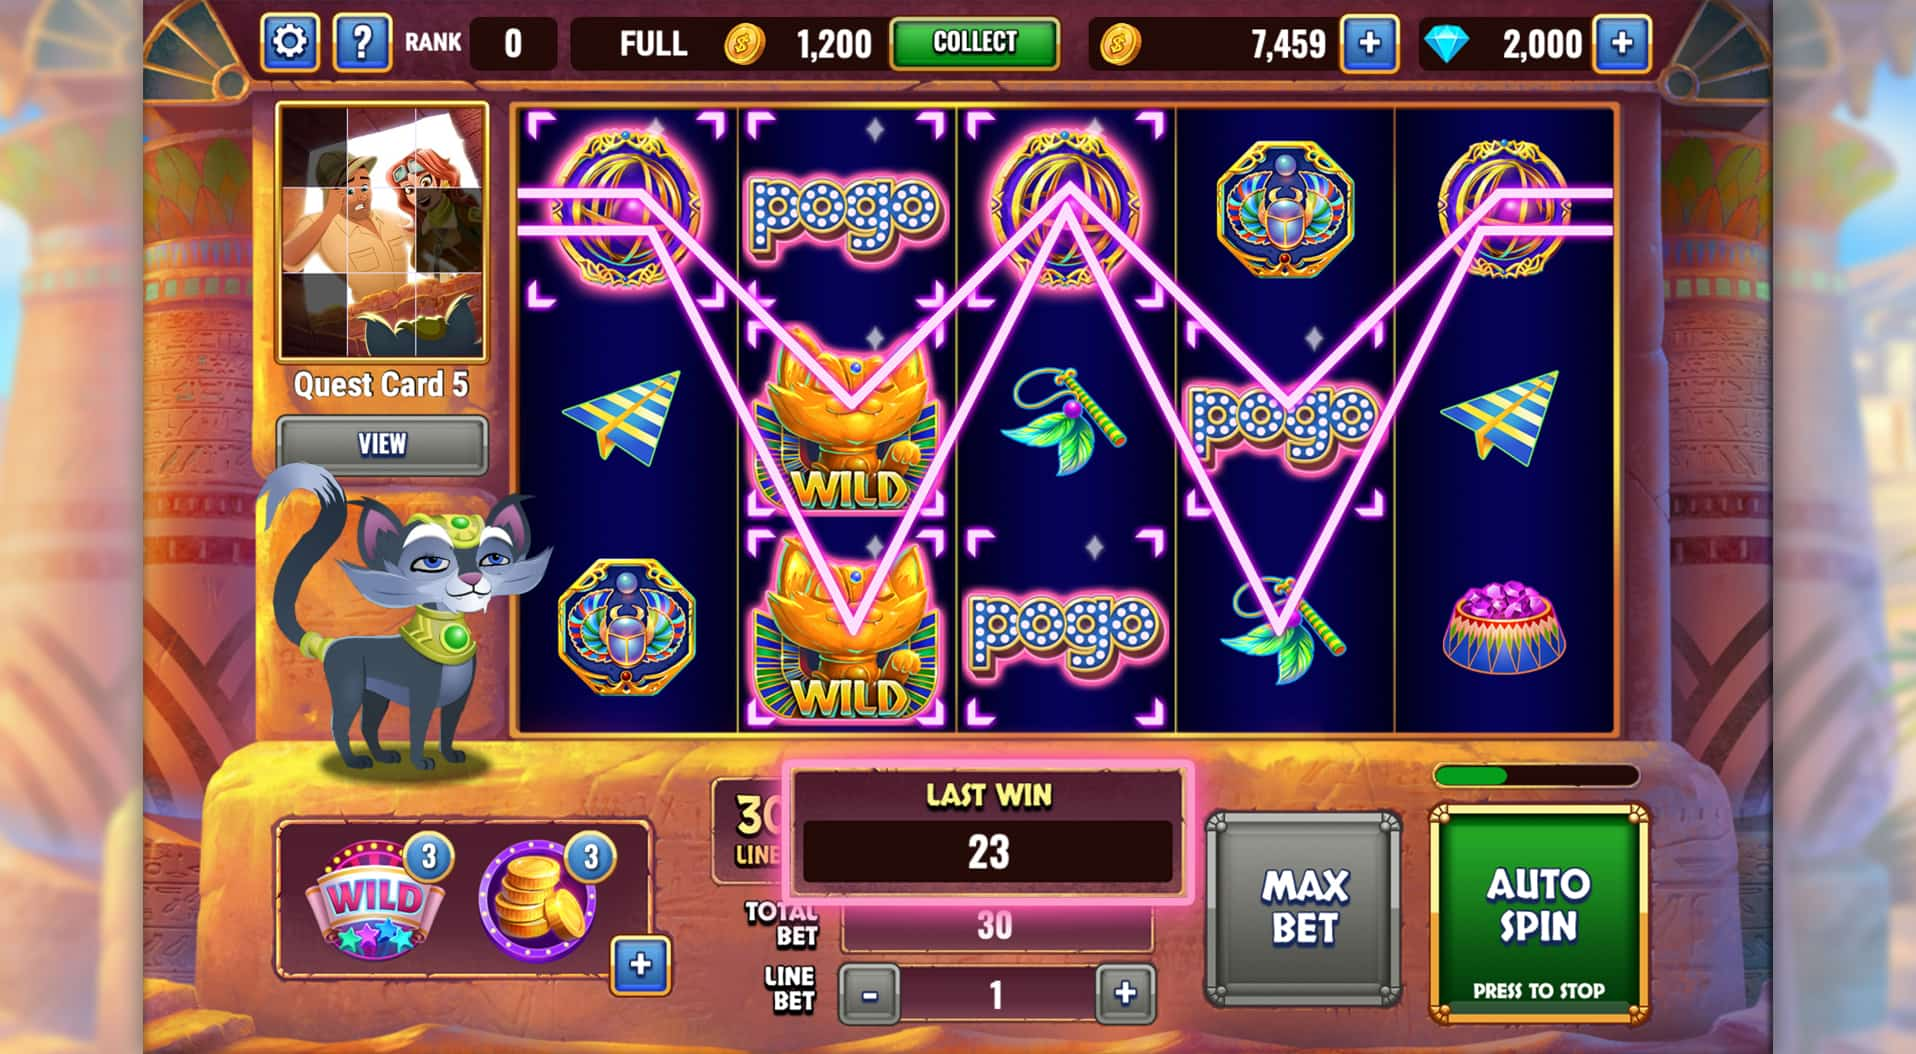 Pogo free casino games sigma slot machines for sale